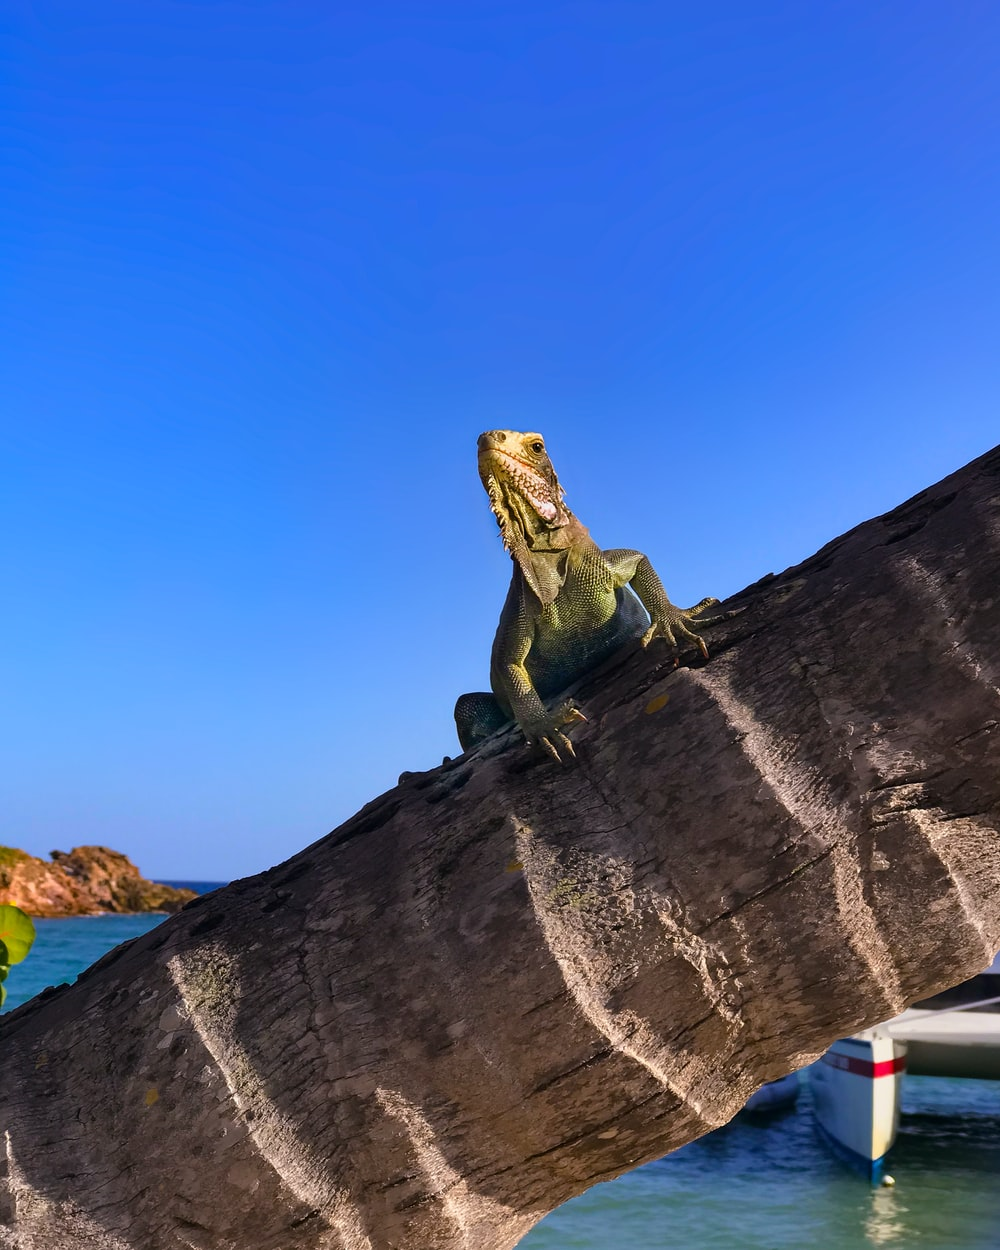 brown iguana on palm tree